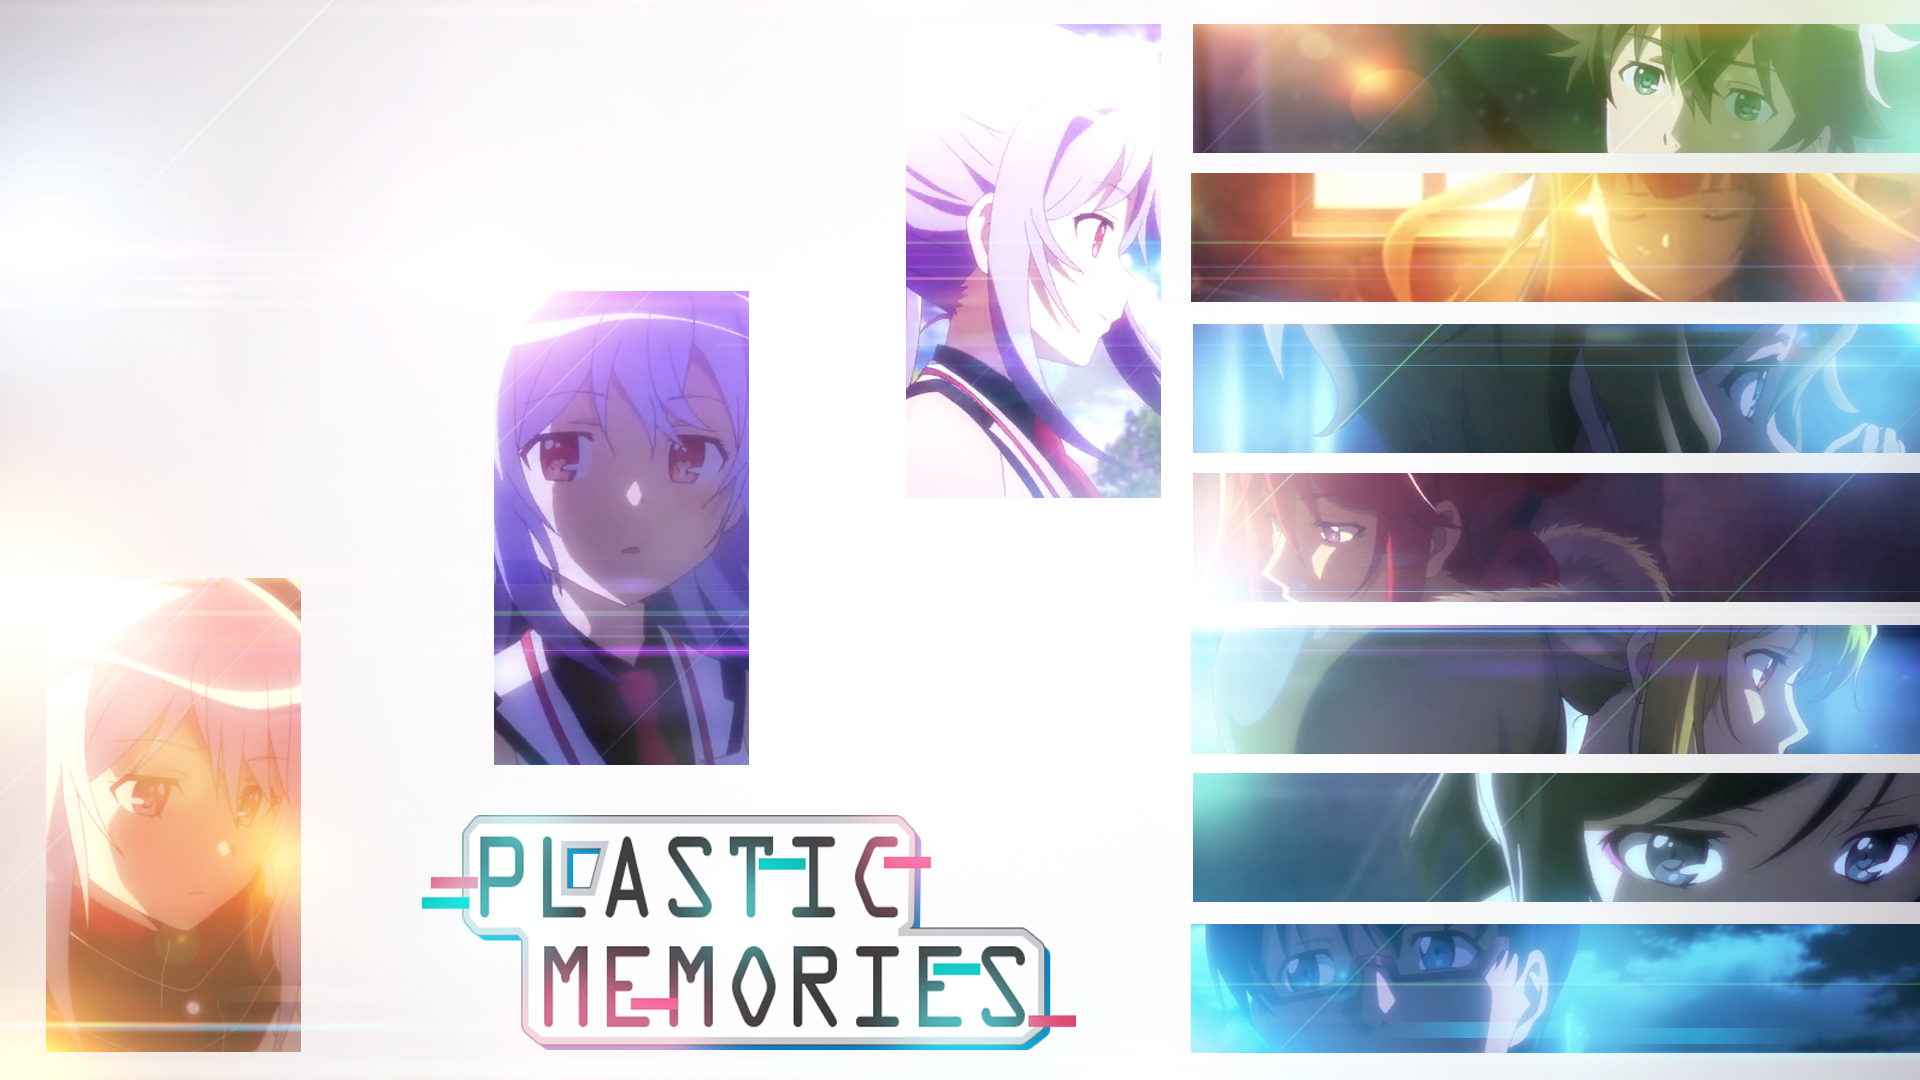 Plastic Memories Wallpaper by AimerNaana